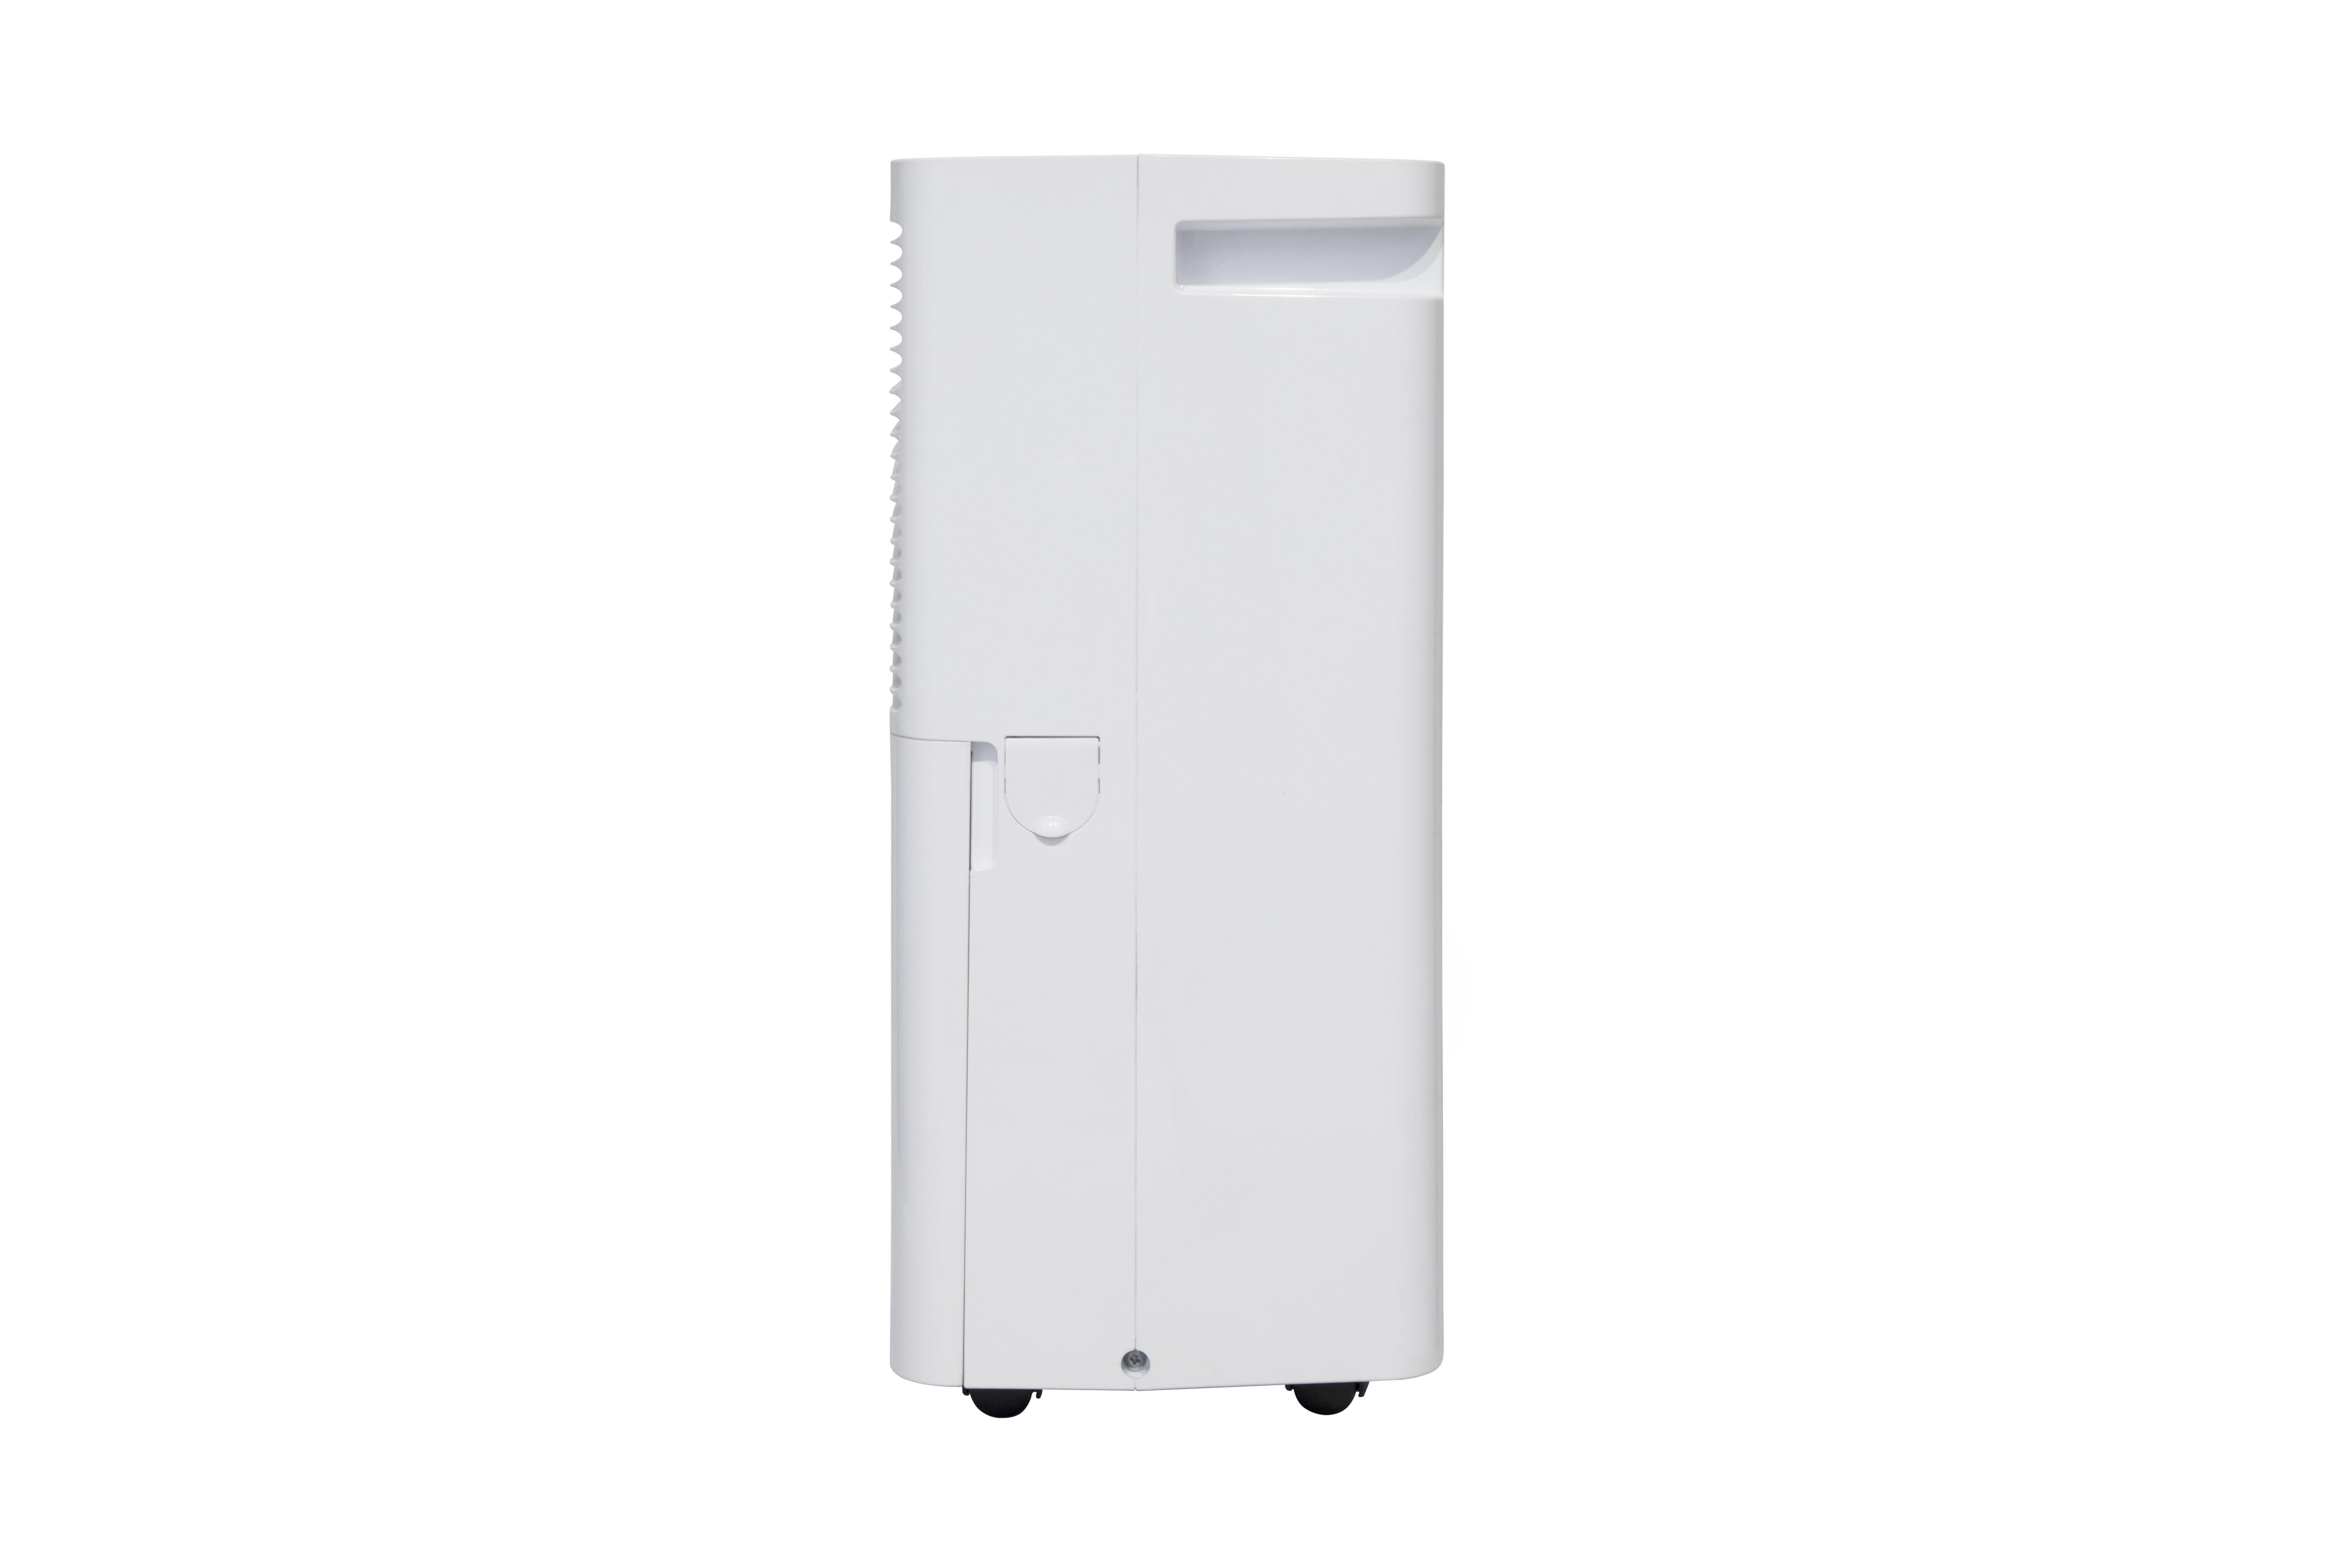 Serie Portatil Deshumidificador DH16